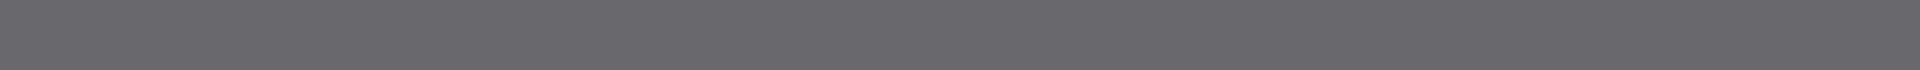 Бордюр Gracia Ceramica Concrete silver 600х20 (стекло)